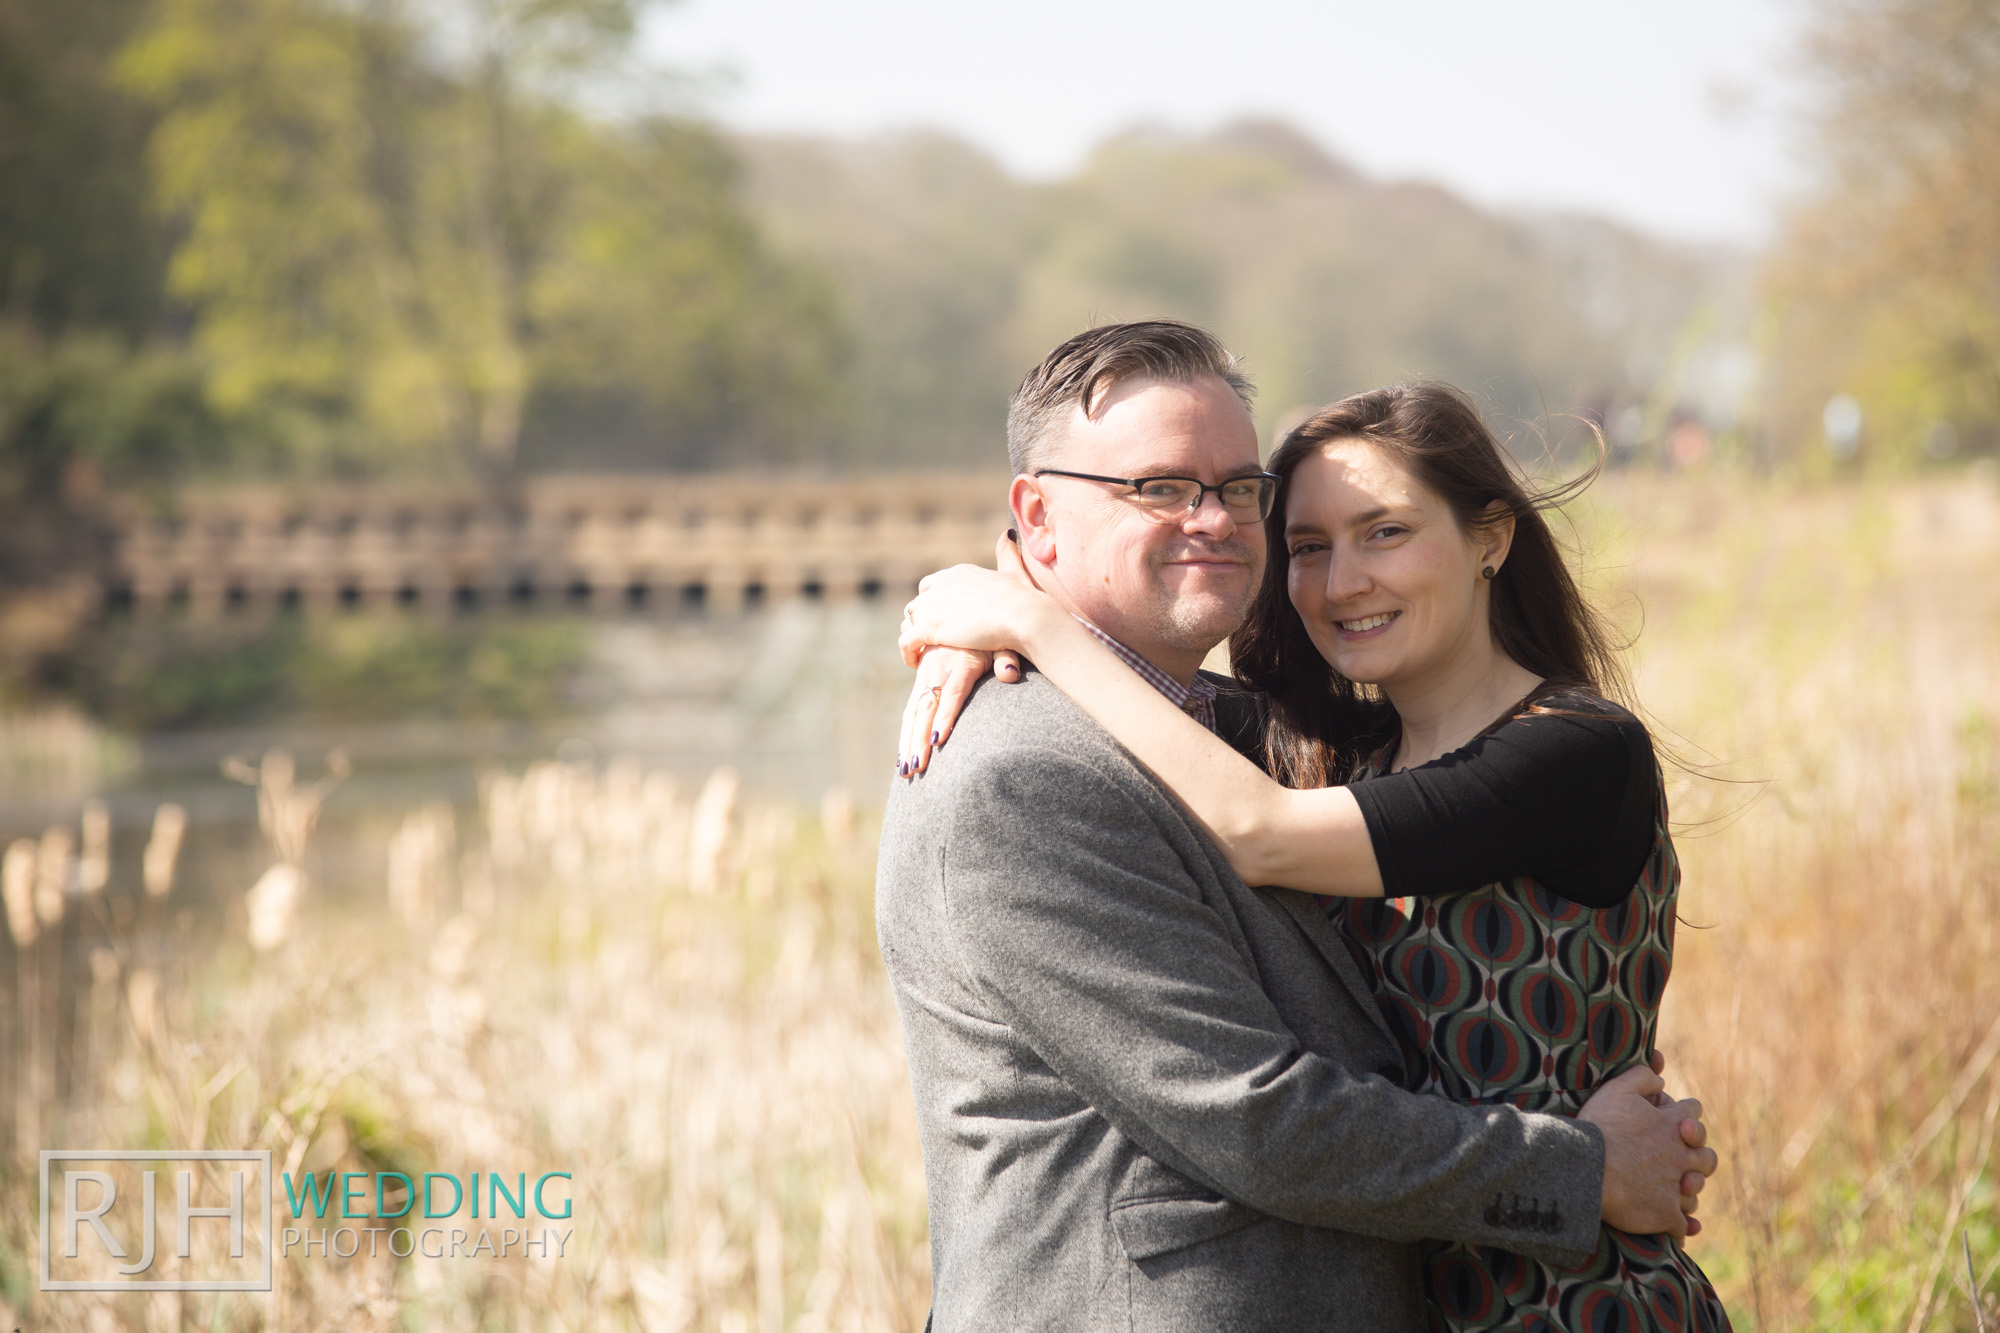 Pre-wedding photography - Richard & Rachel_016_3C2A8208.jpg